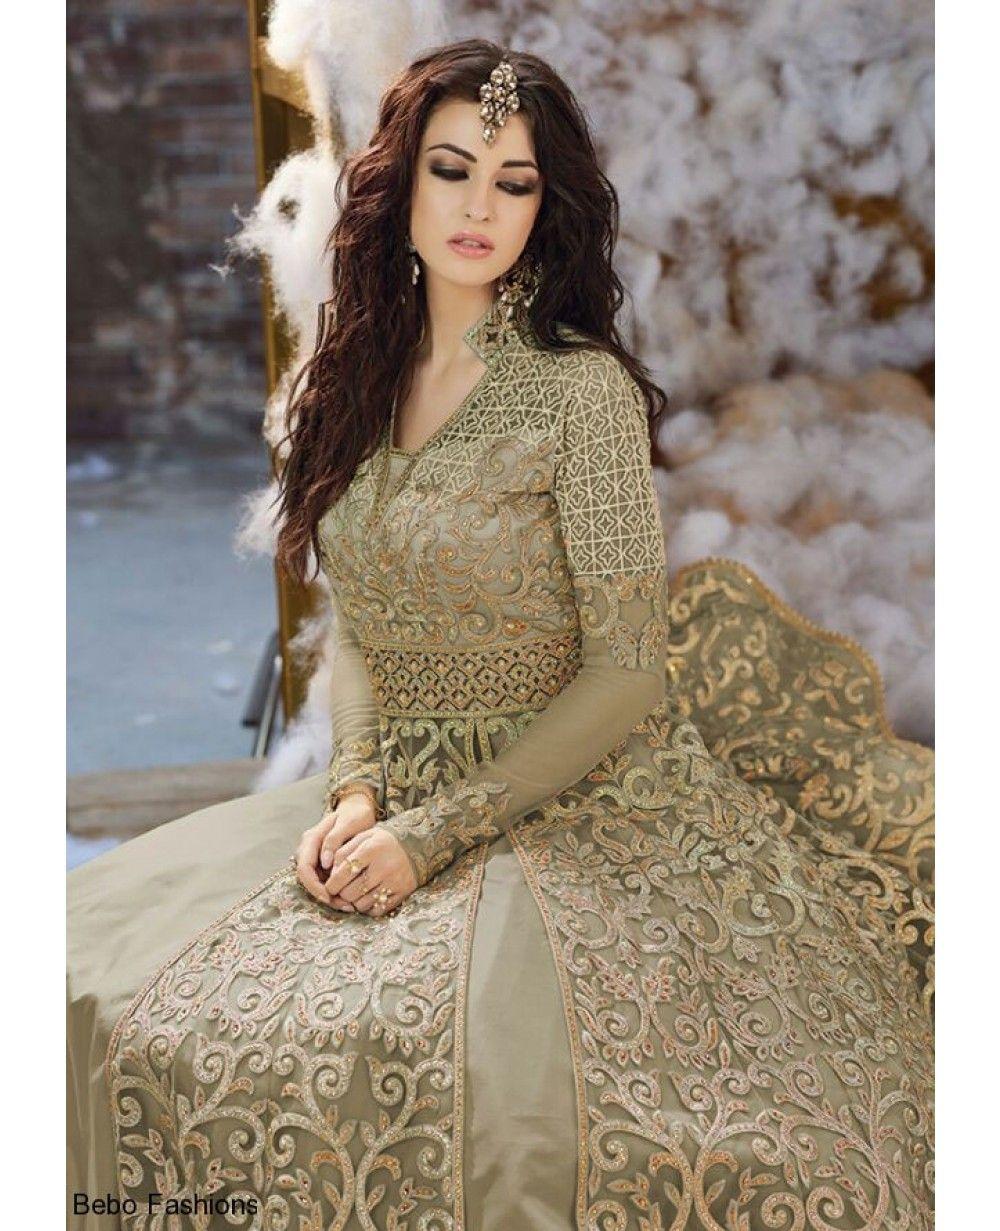 A truly stunning laurel green colour wedding festive dress is an